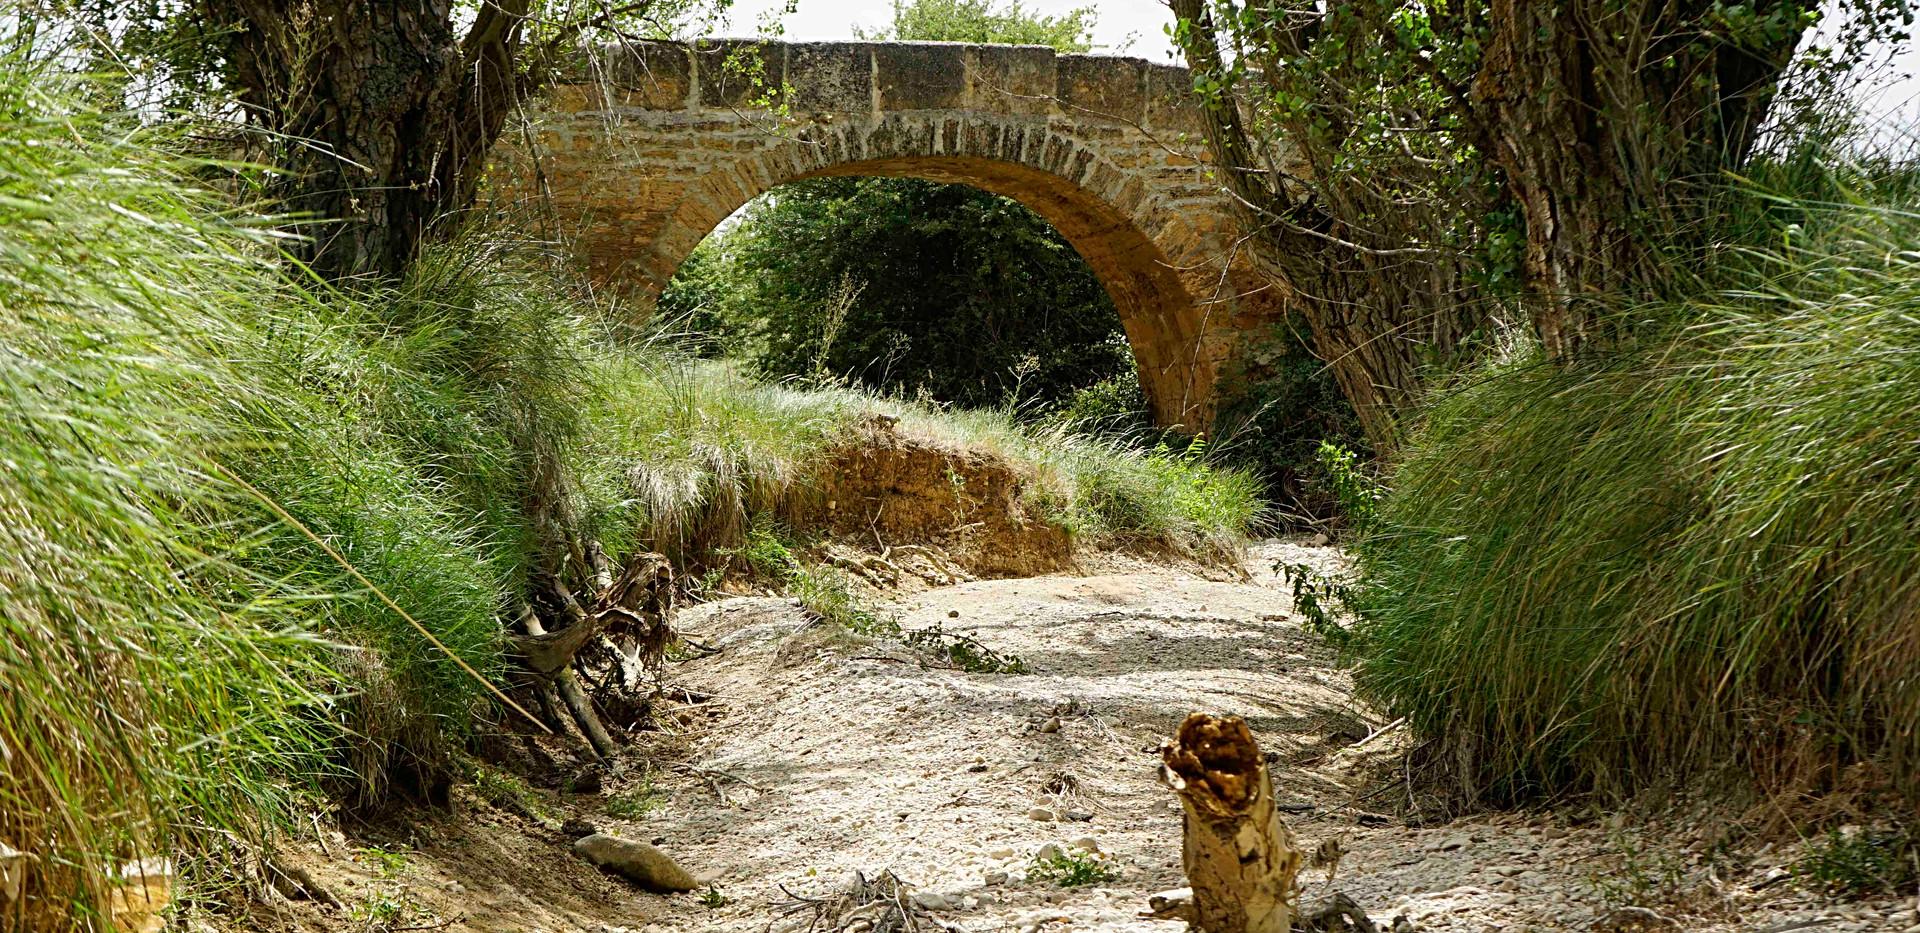 Puente medieval / Medieval bridge